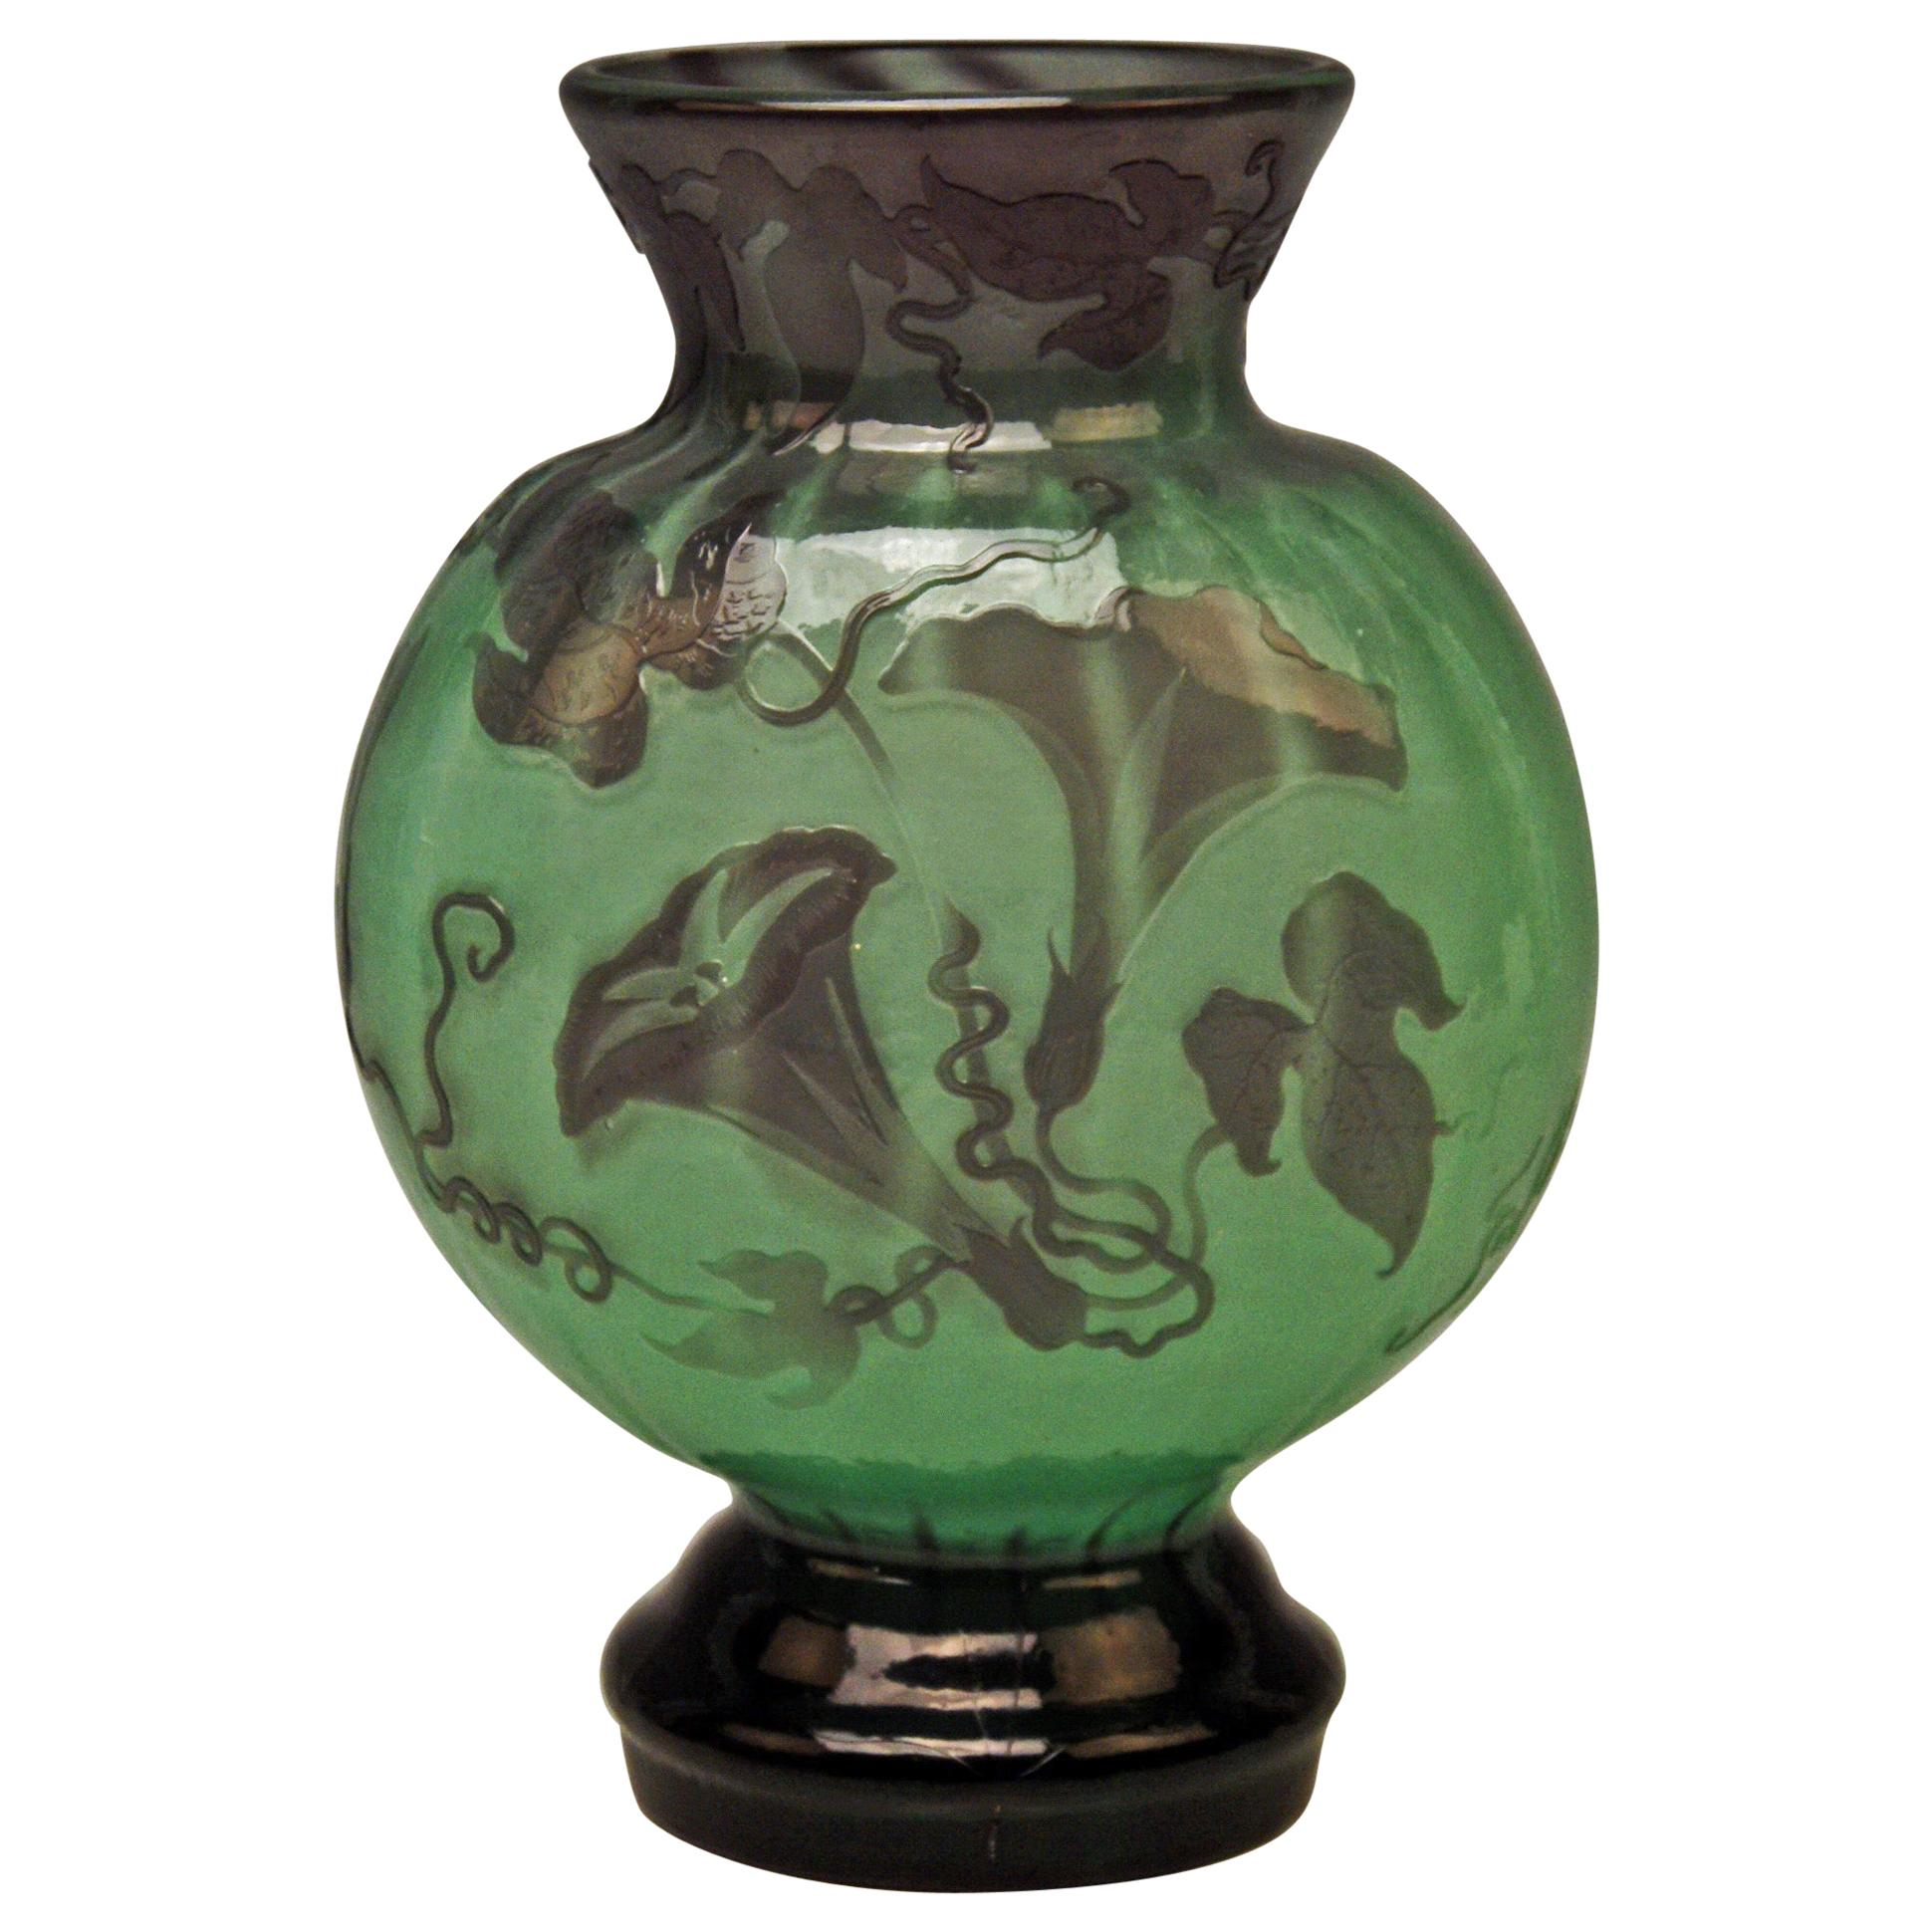 Gallé Art Nouveau Early Vase Galle Fire Polished France Nancy Made, circa 1890